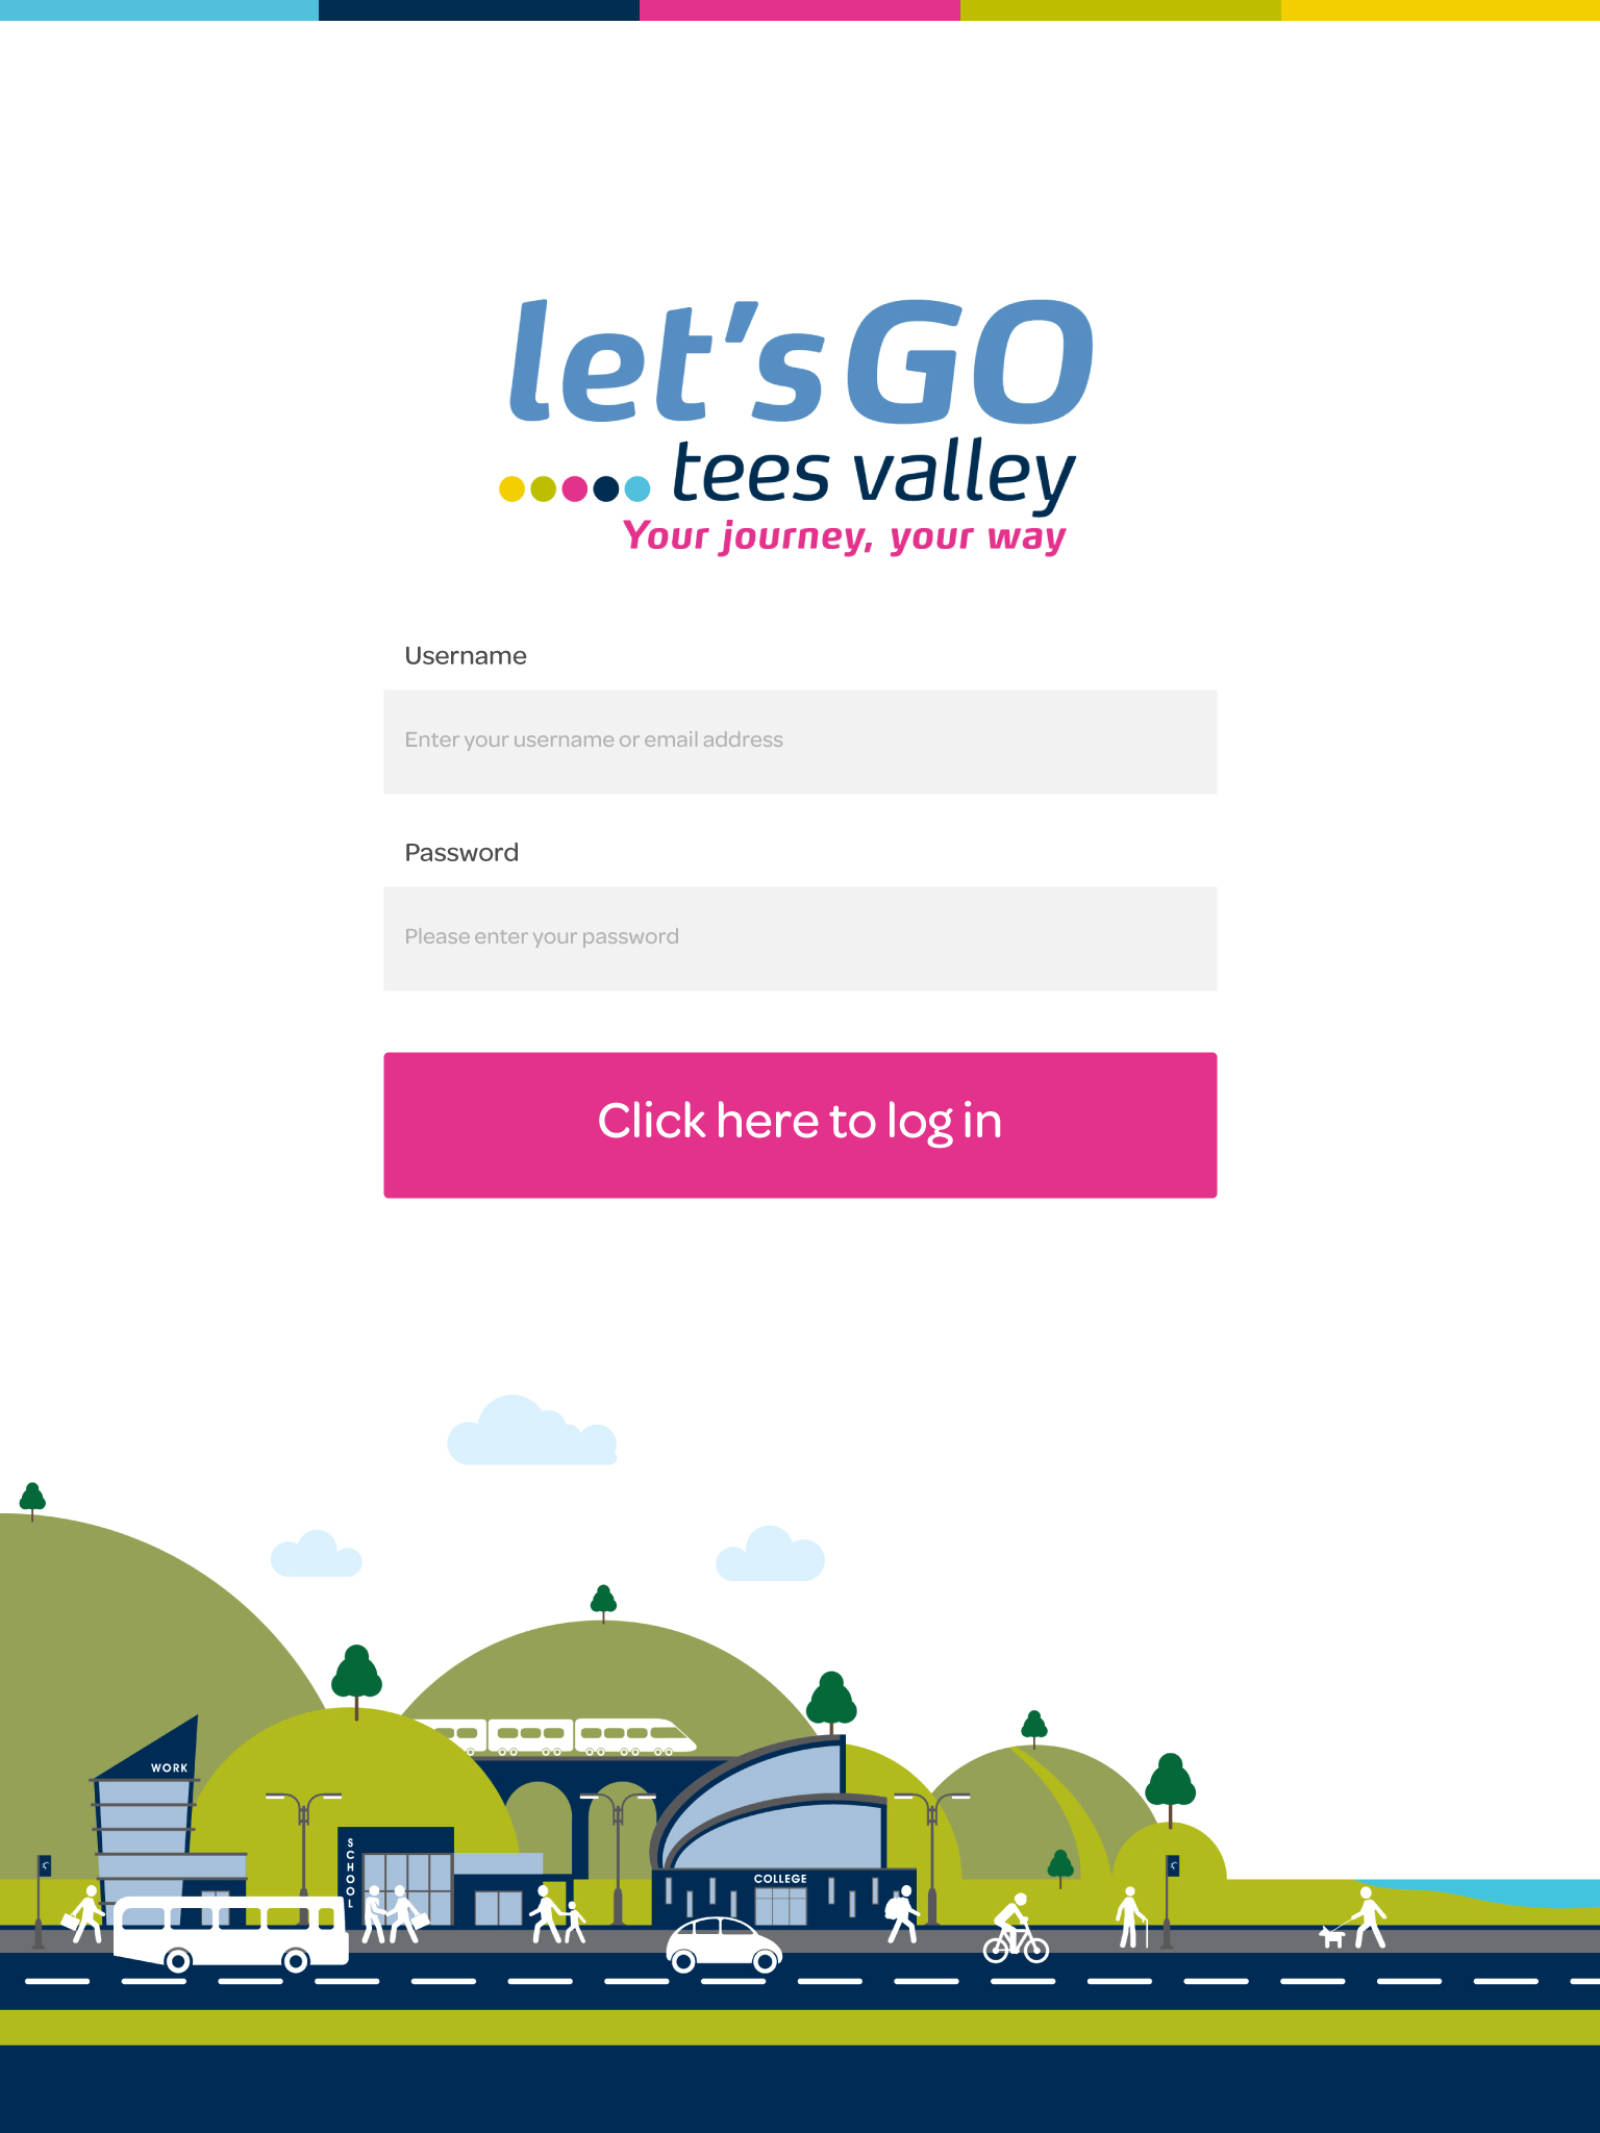 Let's Go Tees Valley | Portfolio | Hush Digital